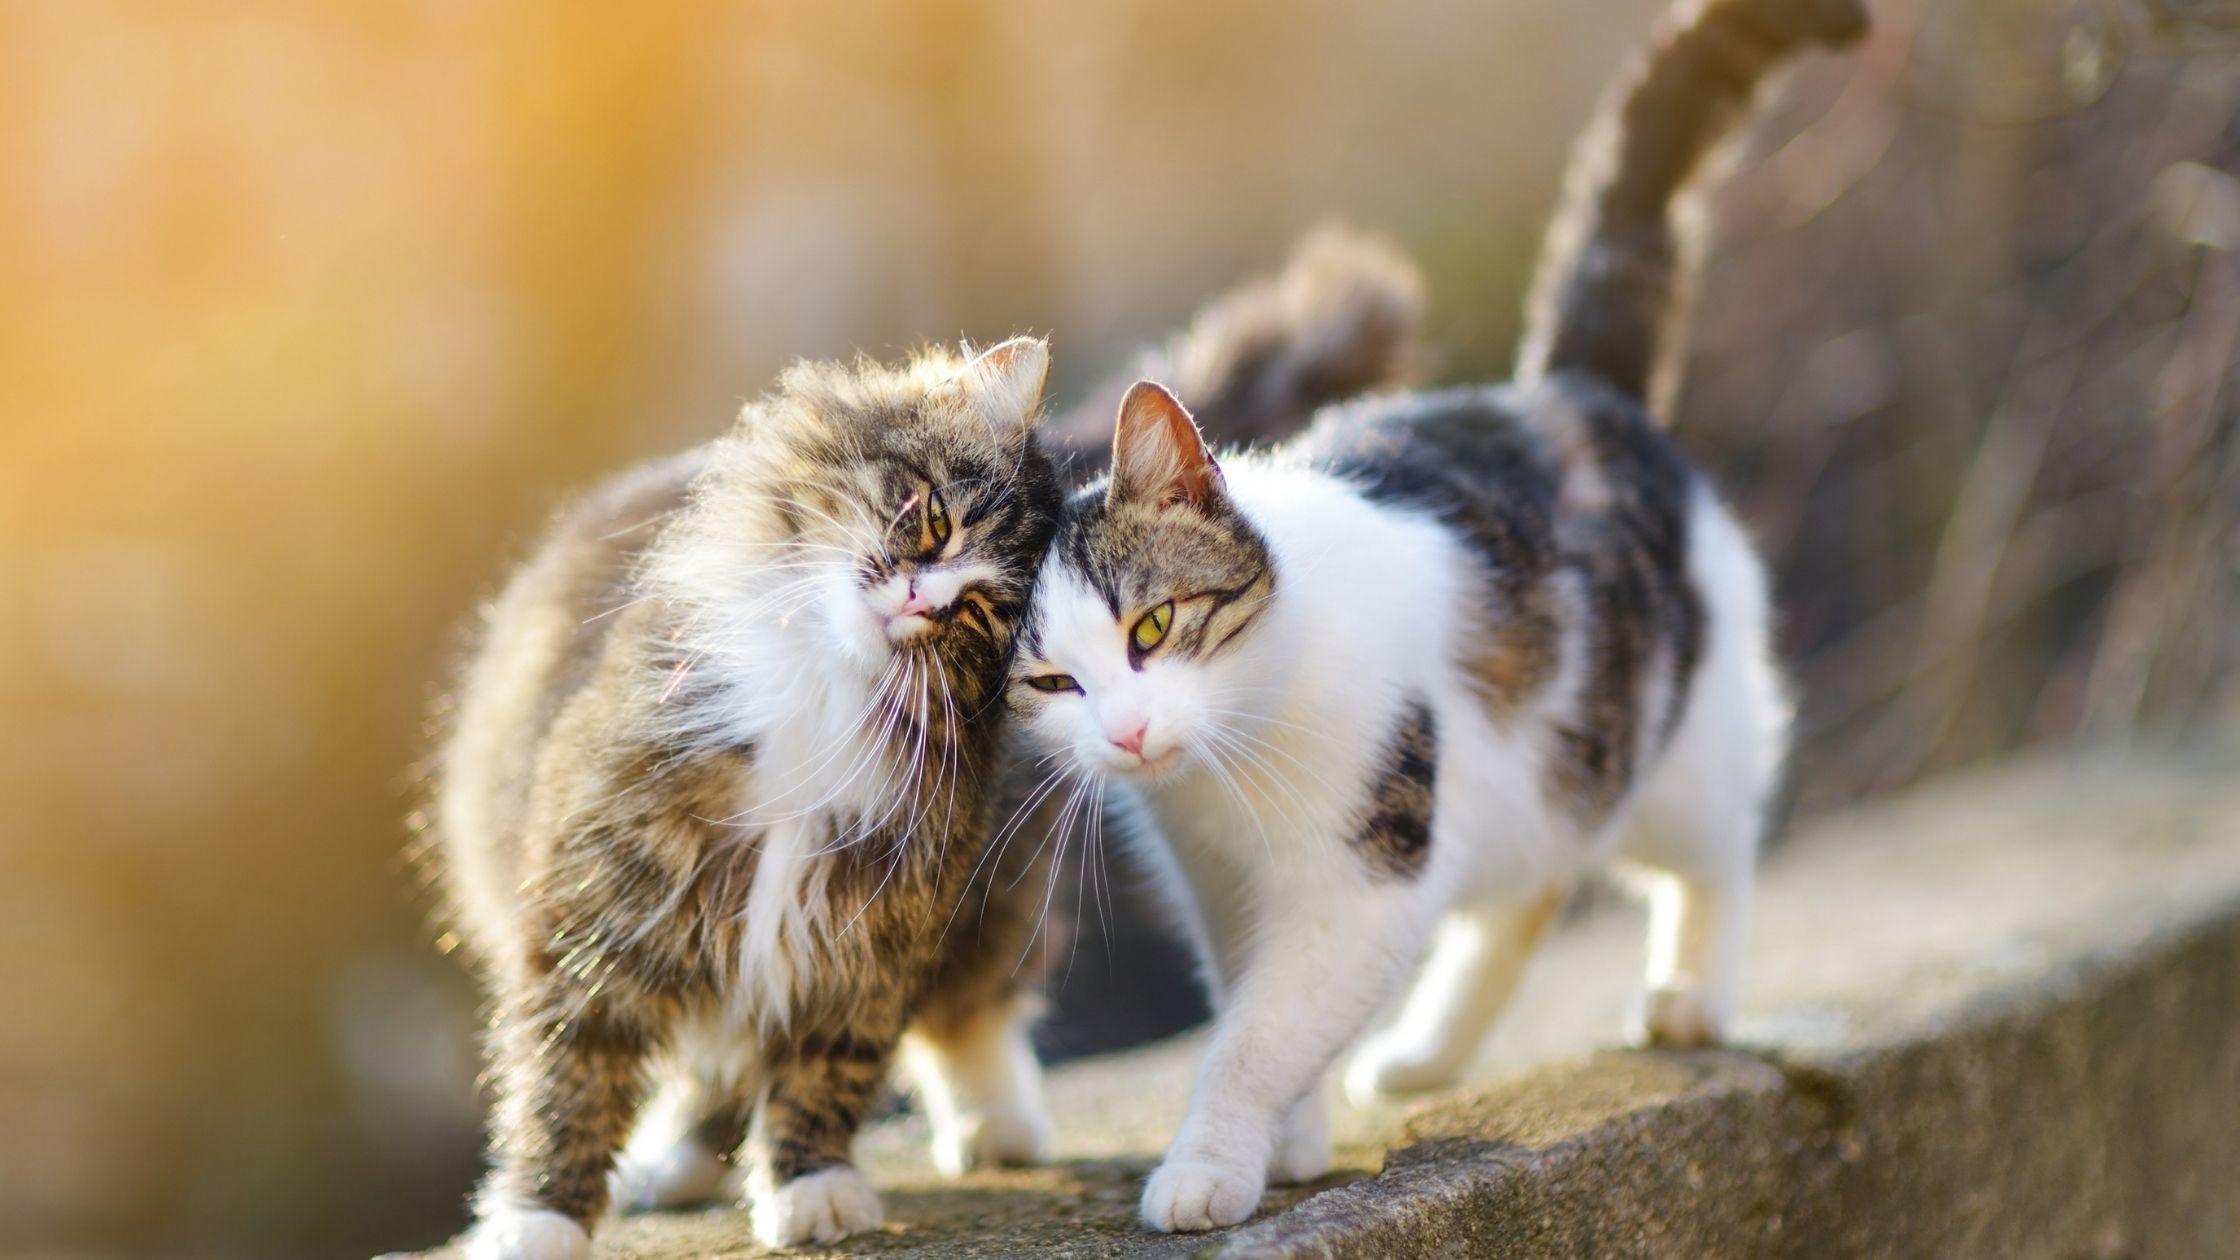 katzen treffen sich